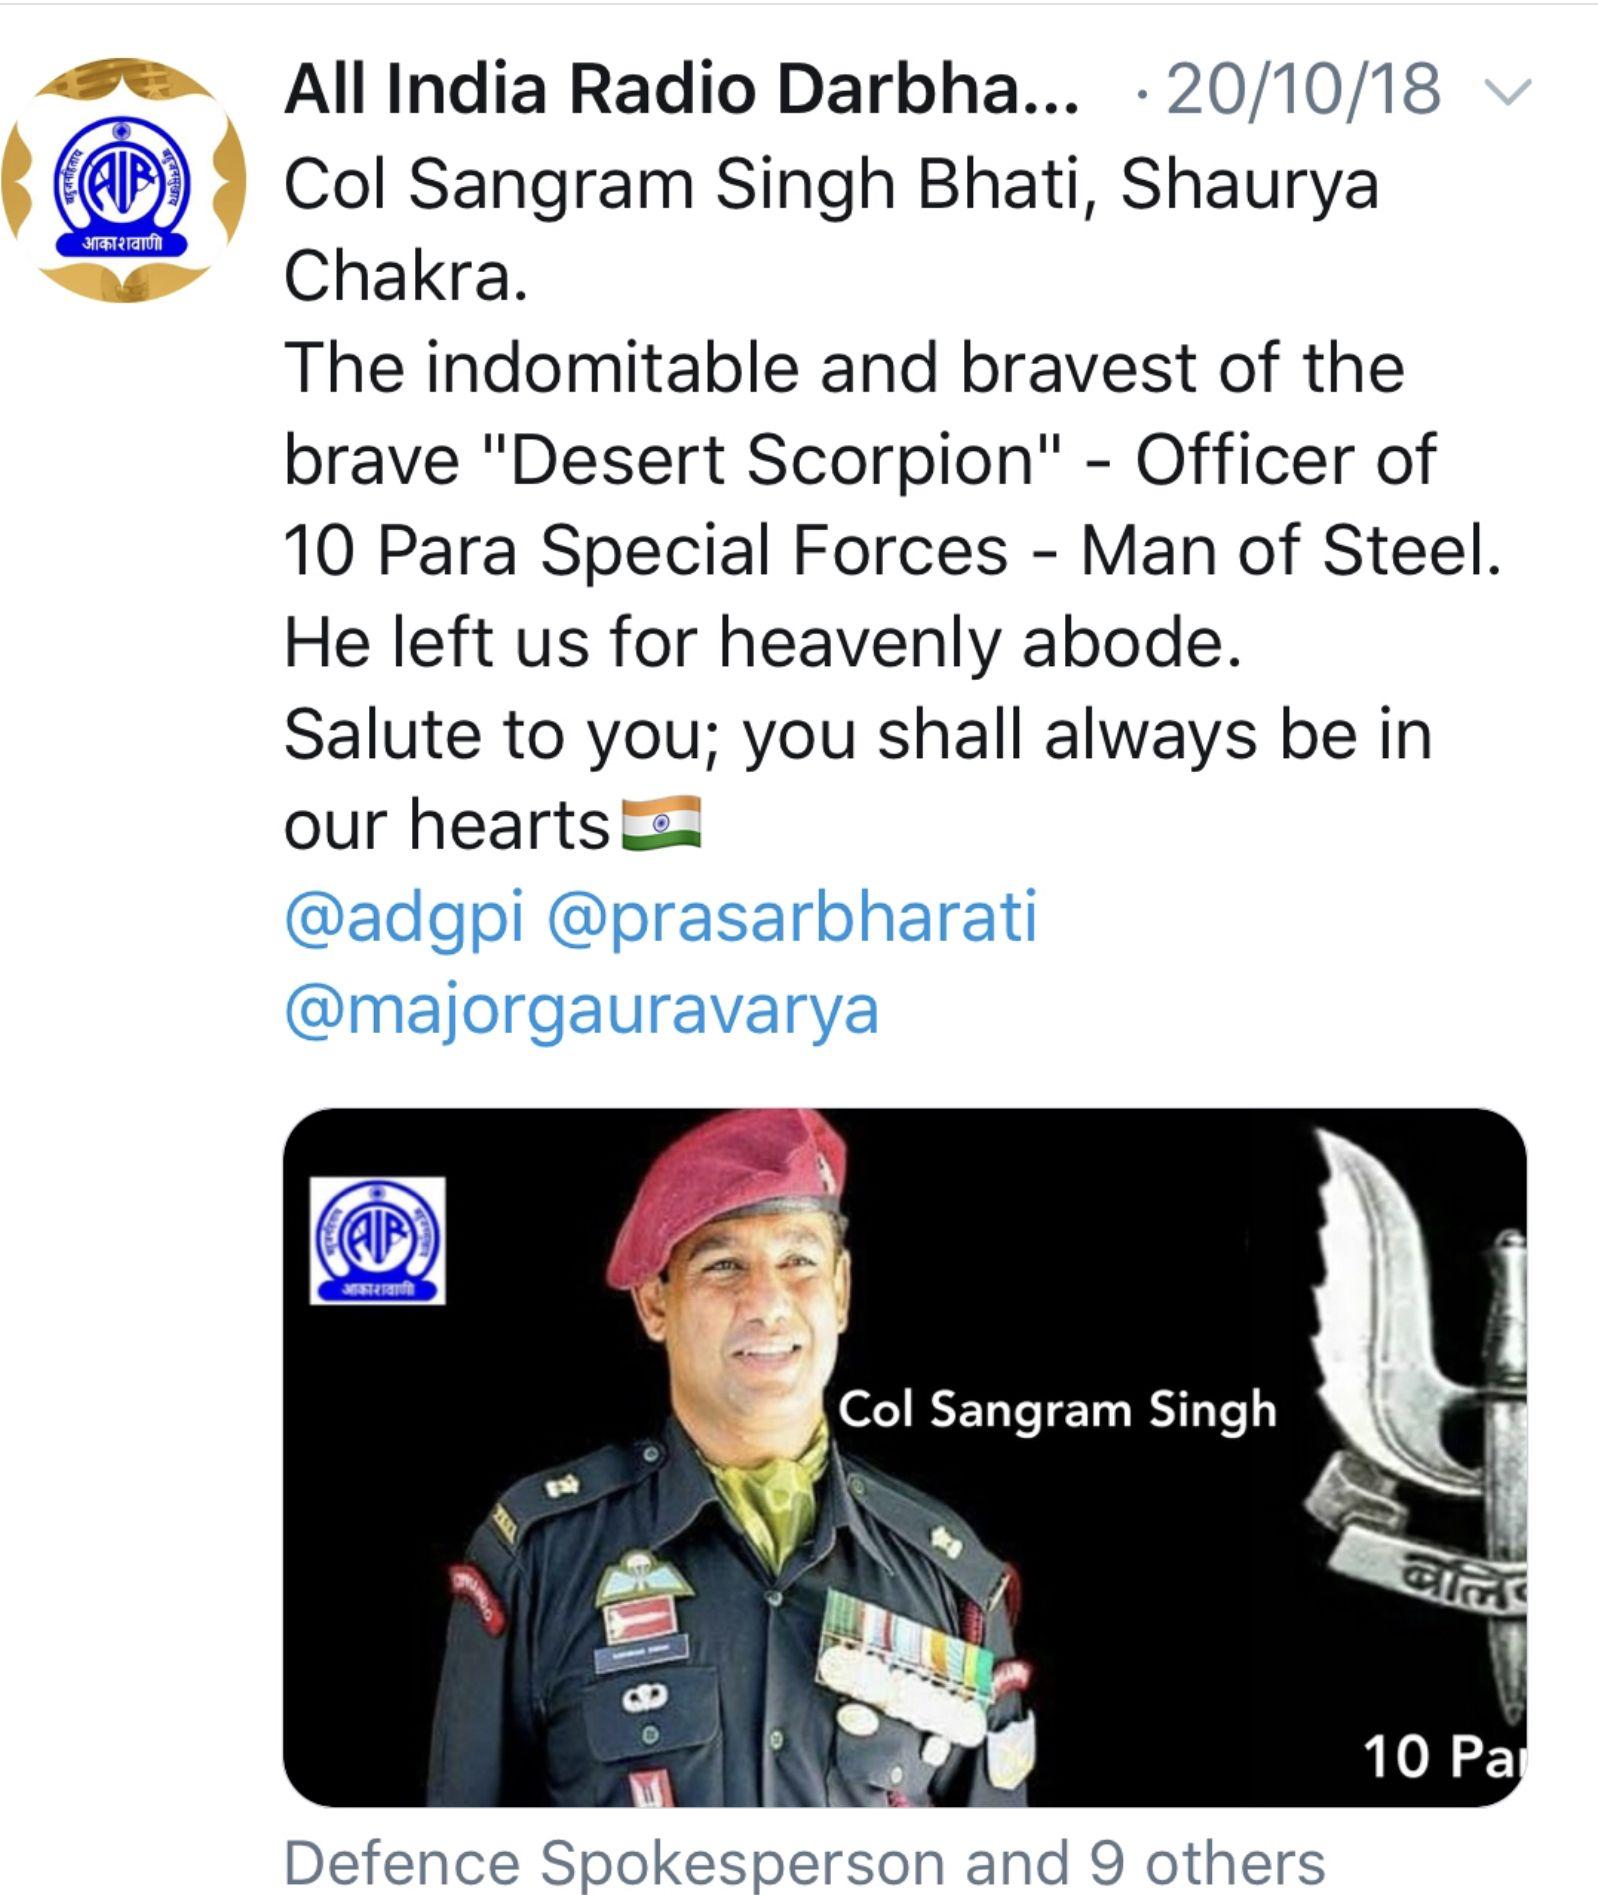 Pin By Vikram Singh Bhati On Col Sangram Singh Bhati Sango 10 Para Sf Man Of Steel Special Forces Man